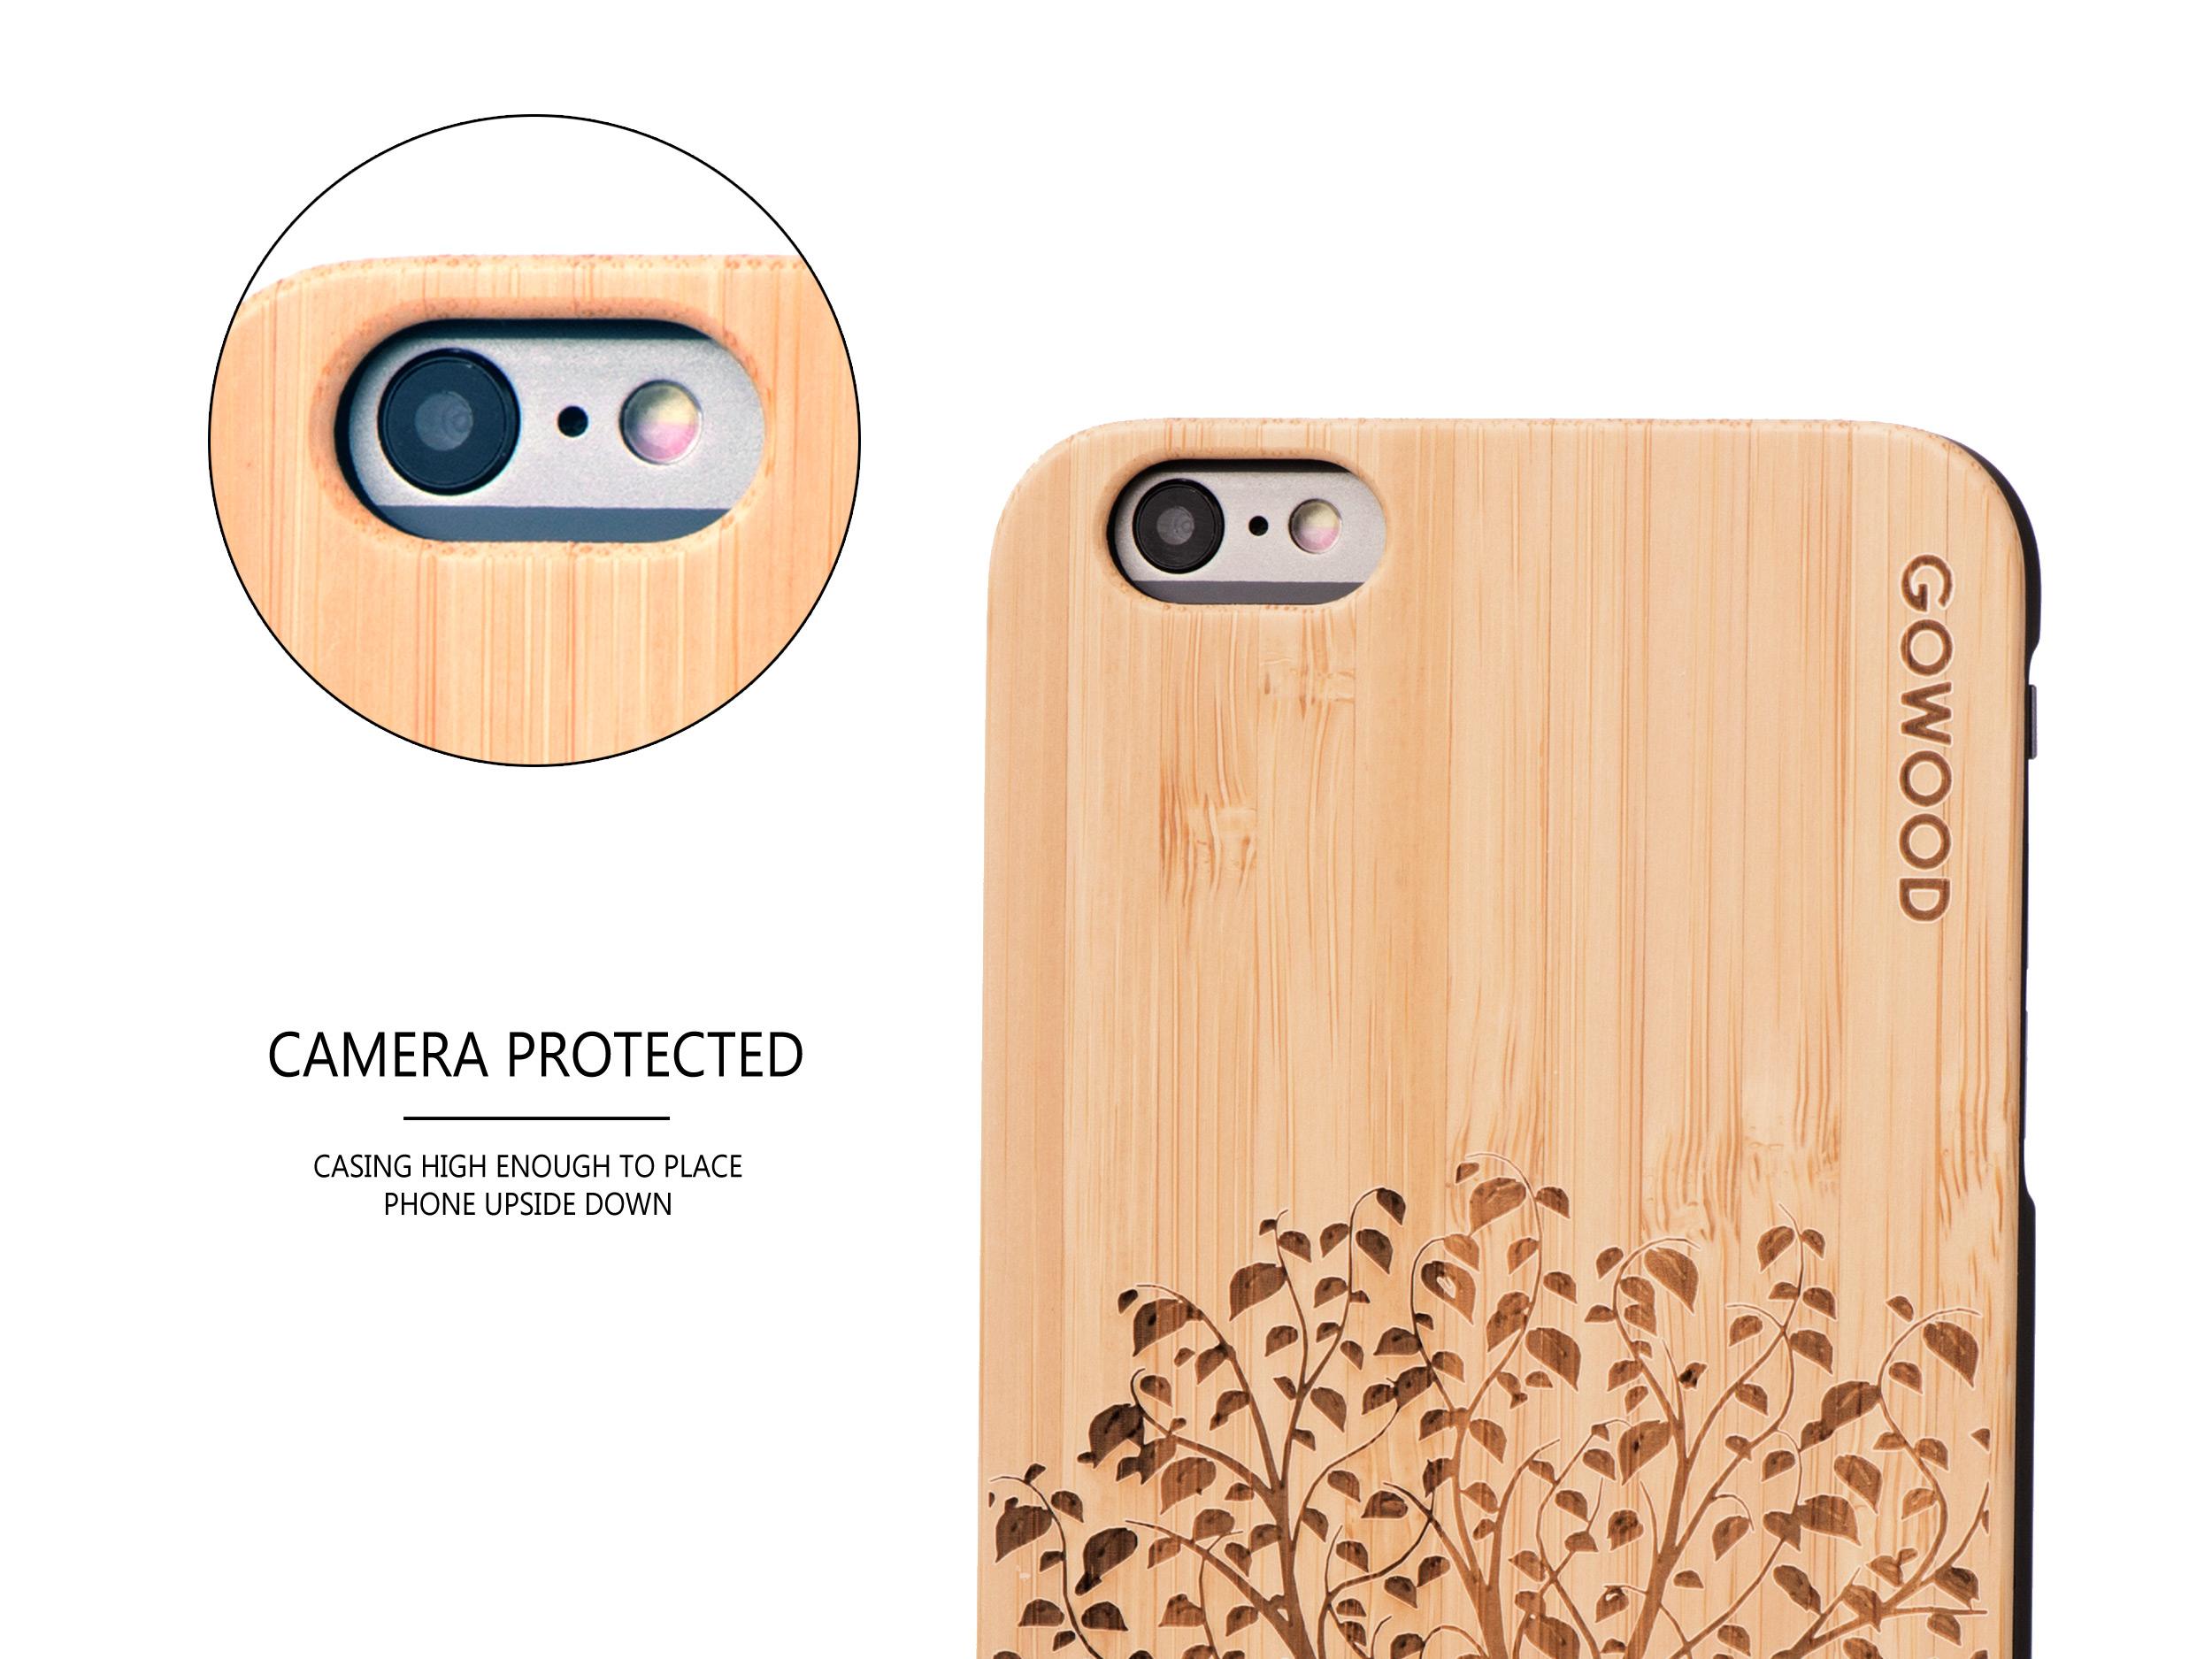 iPhone 6 Plus wood case tree camera